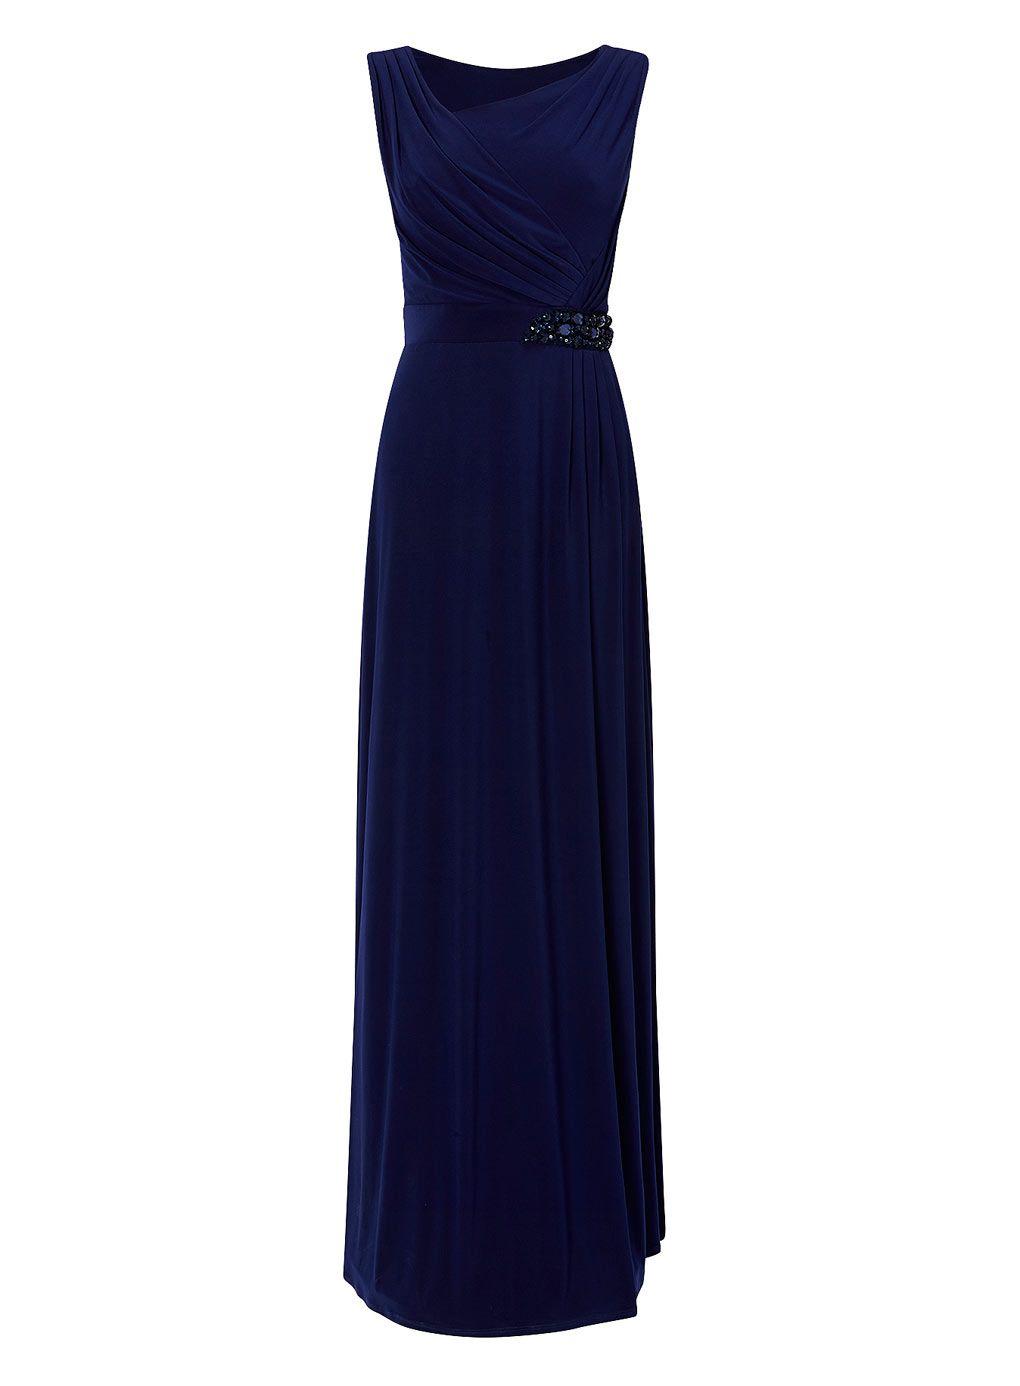 Evie Navy Long Dress - BHS